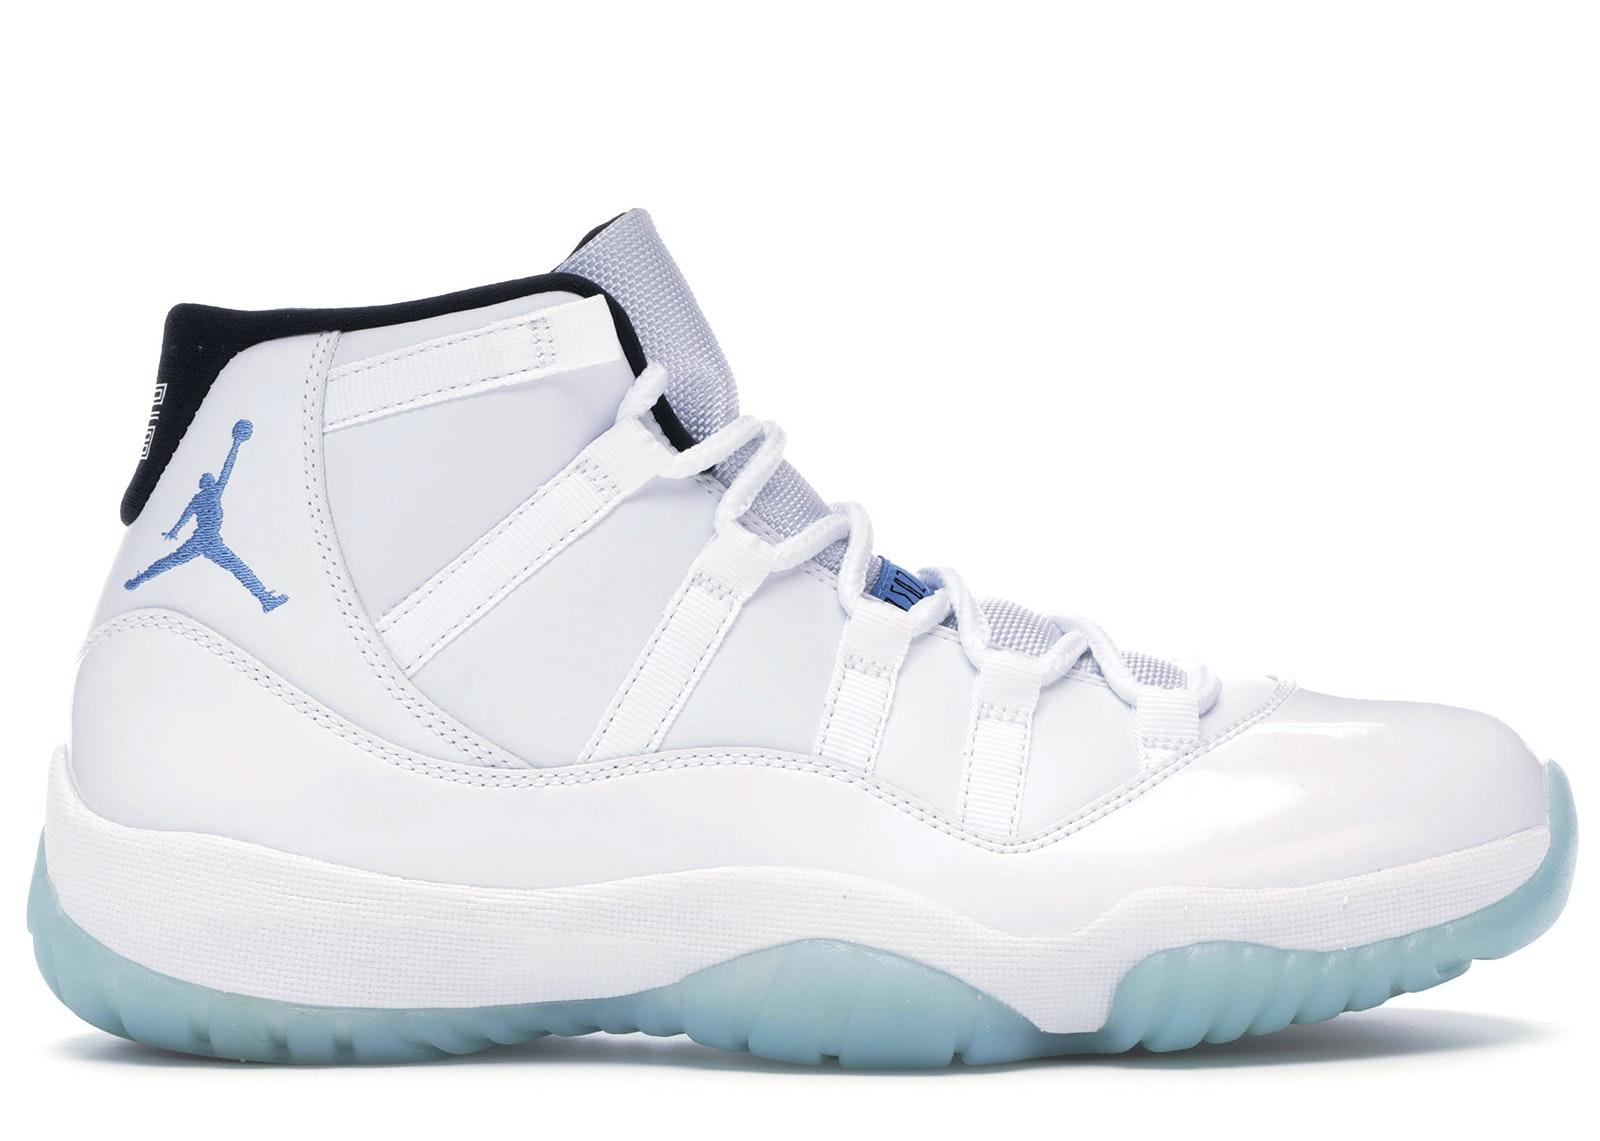 Jordan 11 Retro Legend Blue (2014)